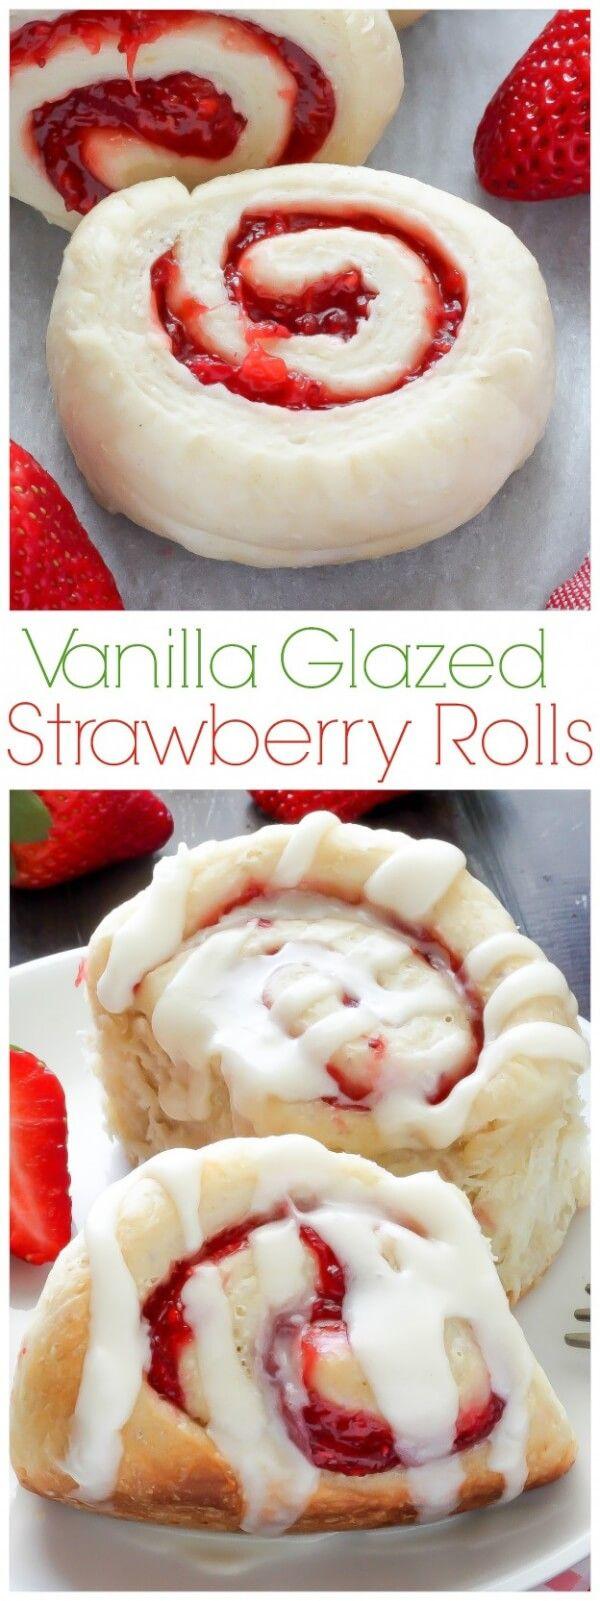 Strawberry Rolls with Vanilla Glaze Recipe